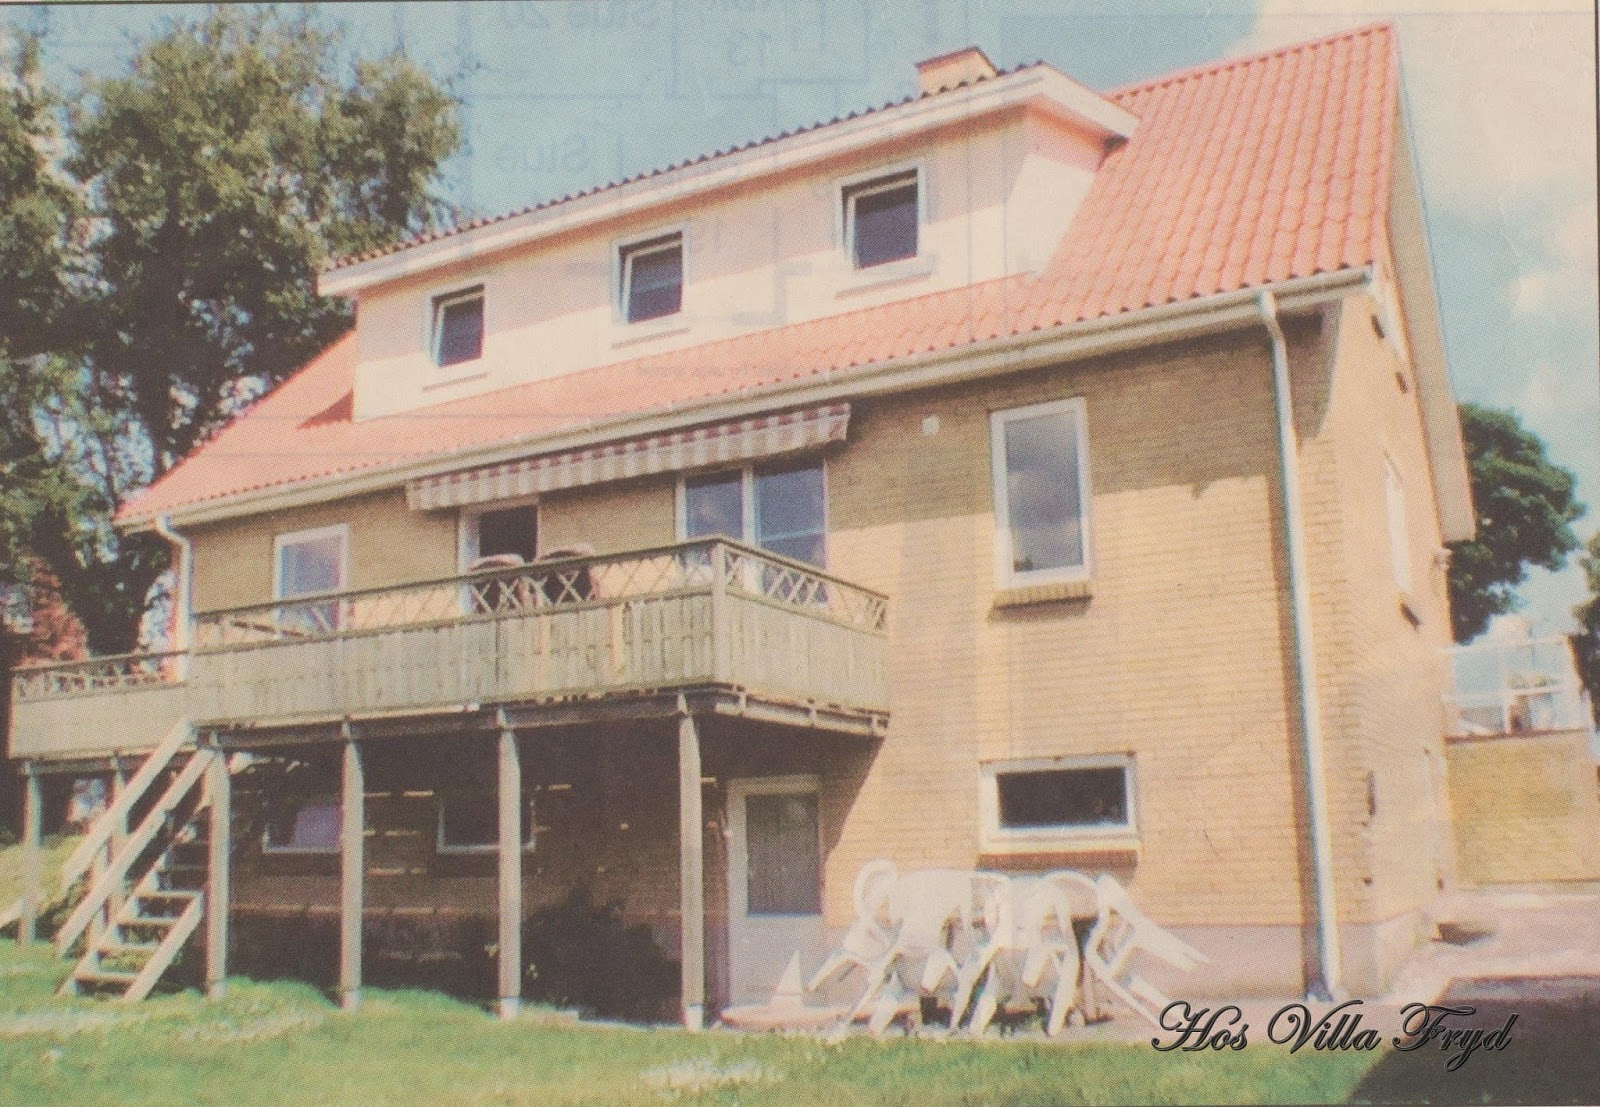 Hos Villa Fryd: Sprossede vinduer